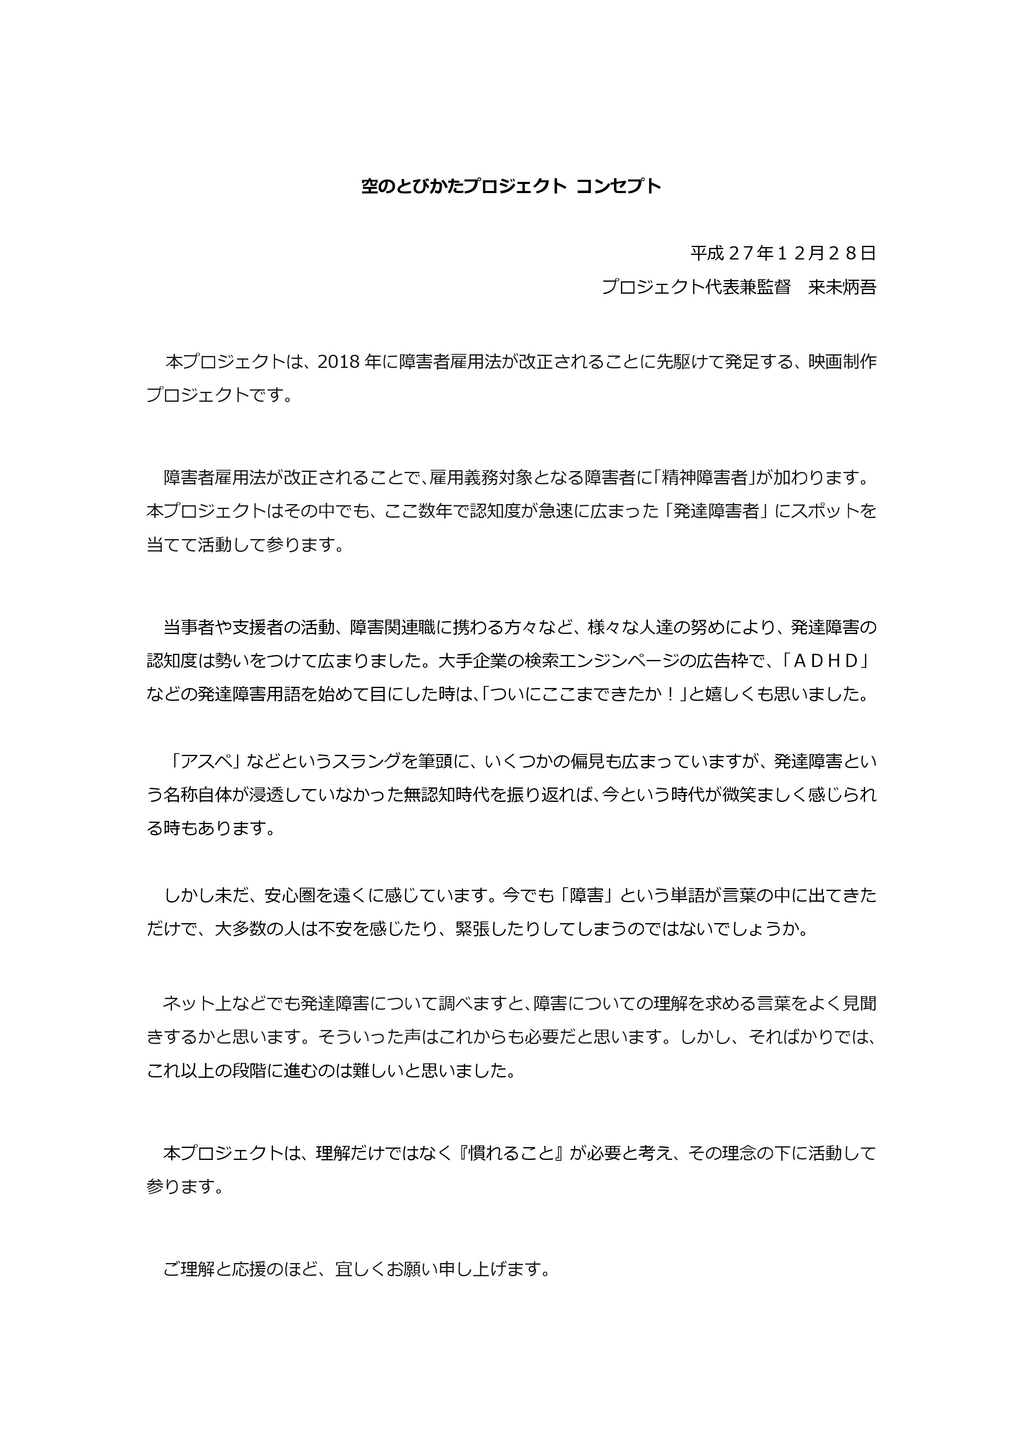 f:id:hyogokurumi:20200607001102j:plain